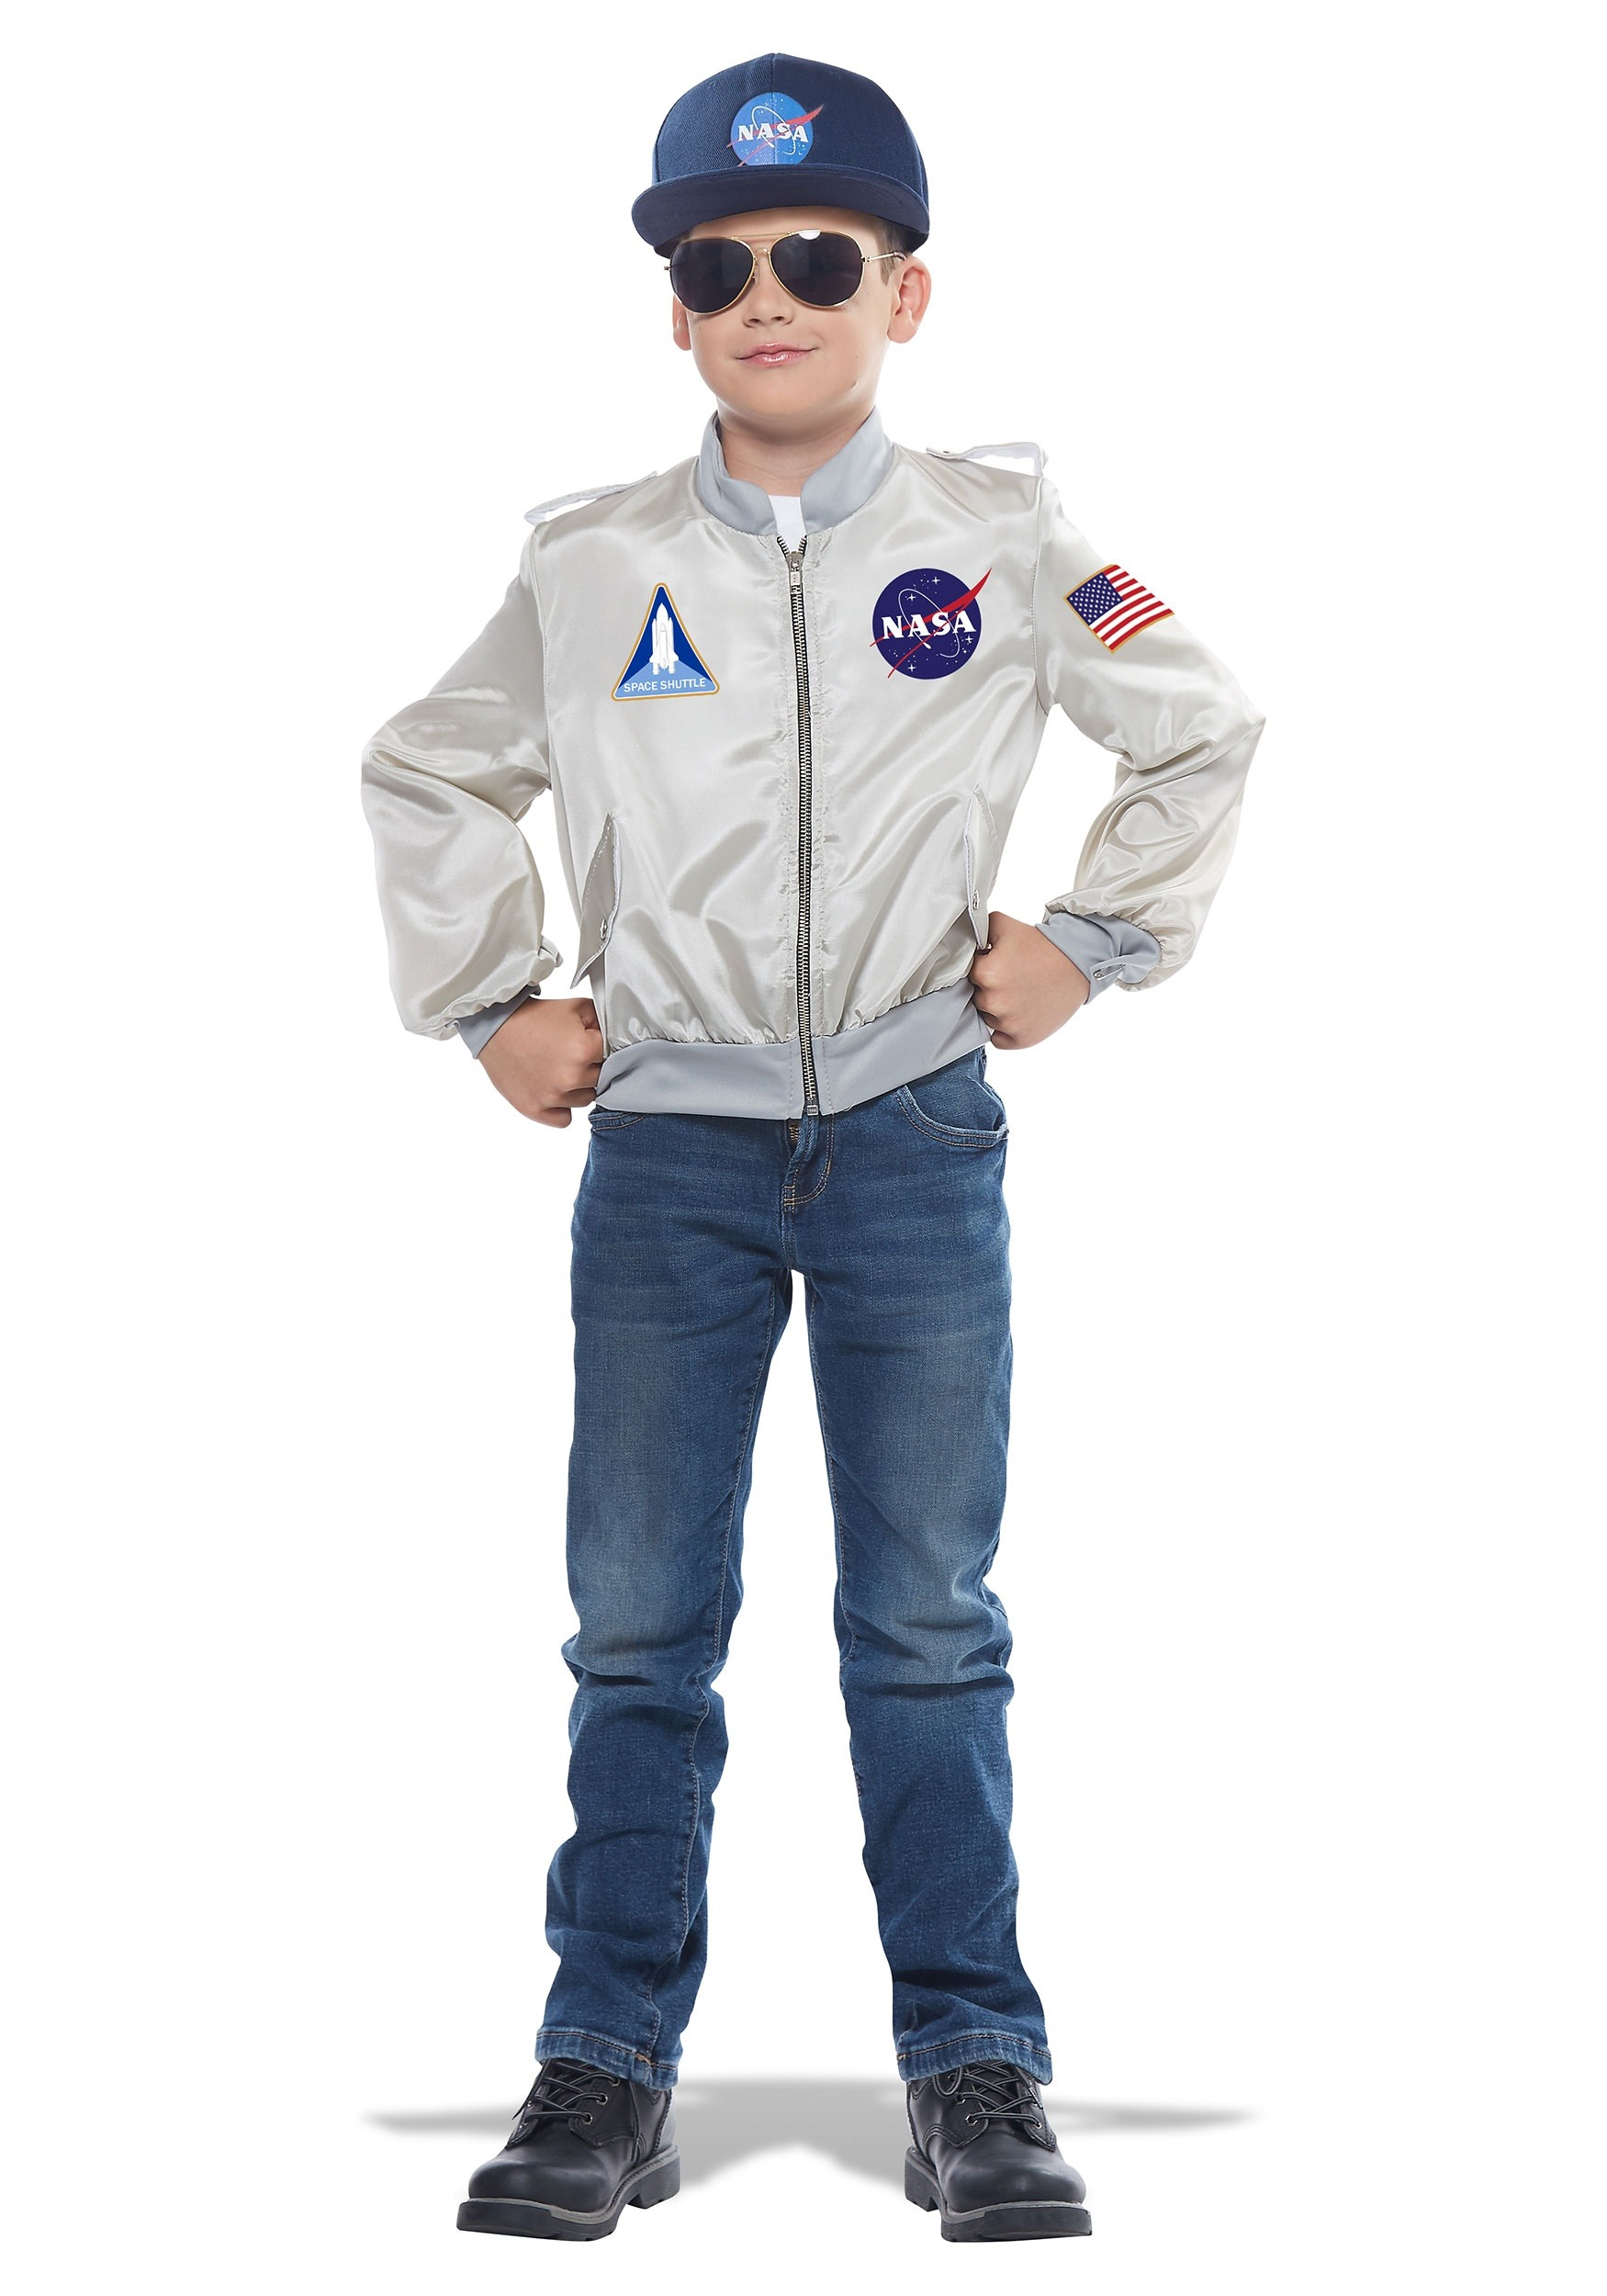 NASA Flight Jacket Costume for Children